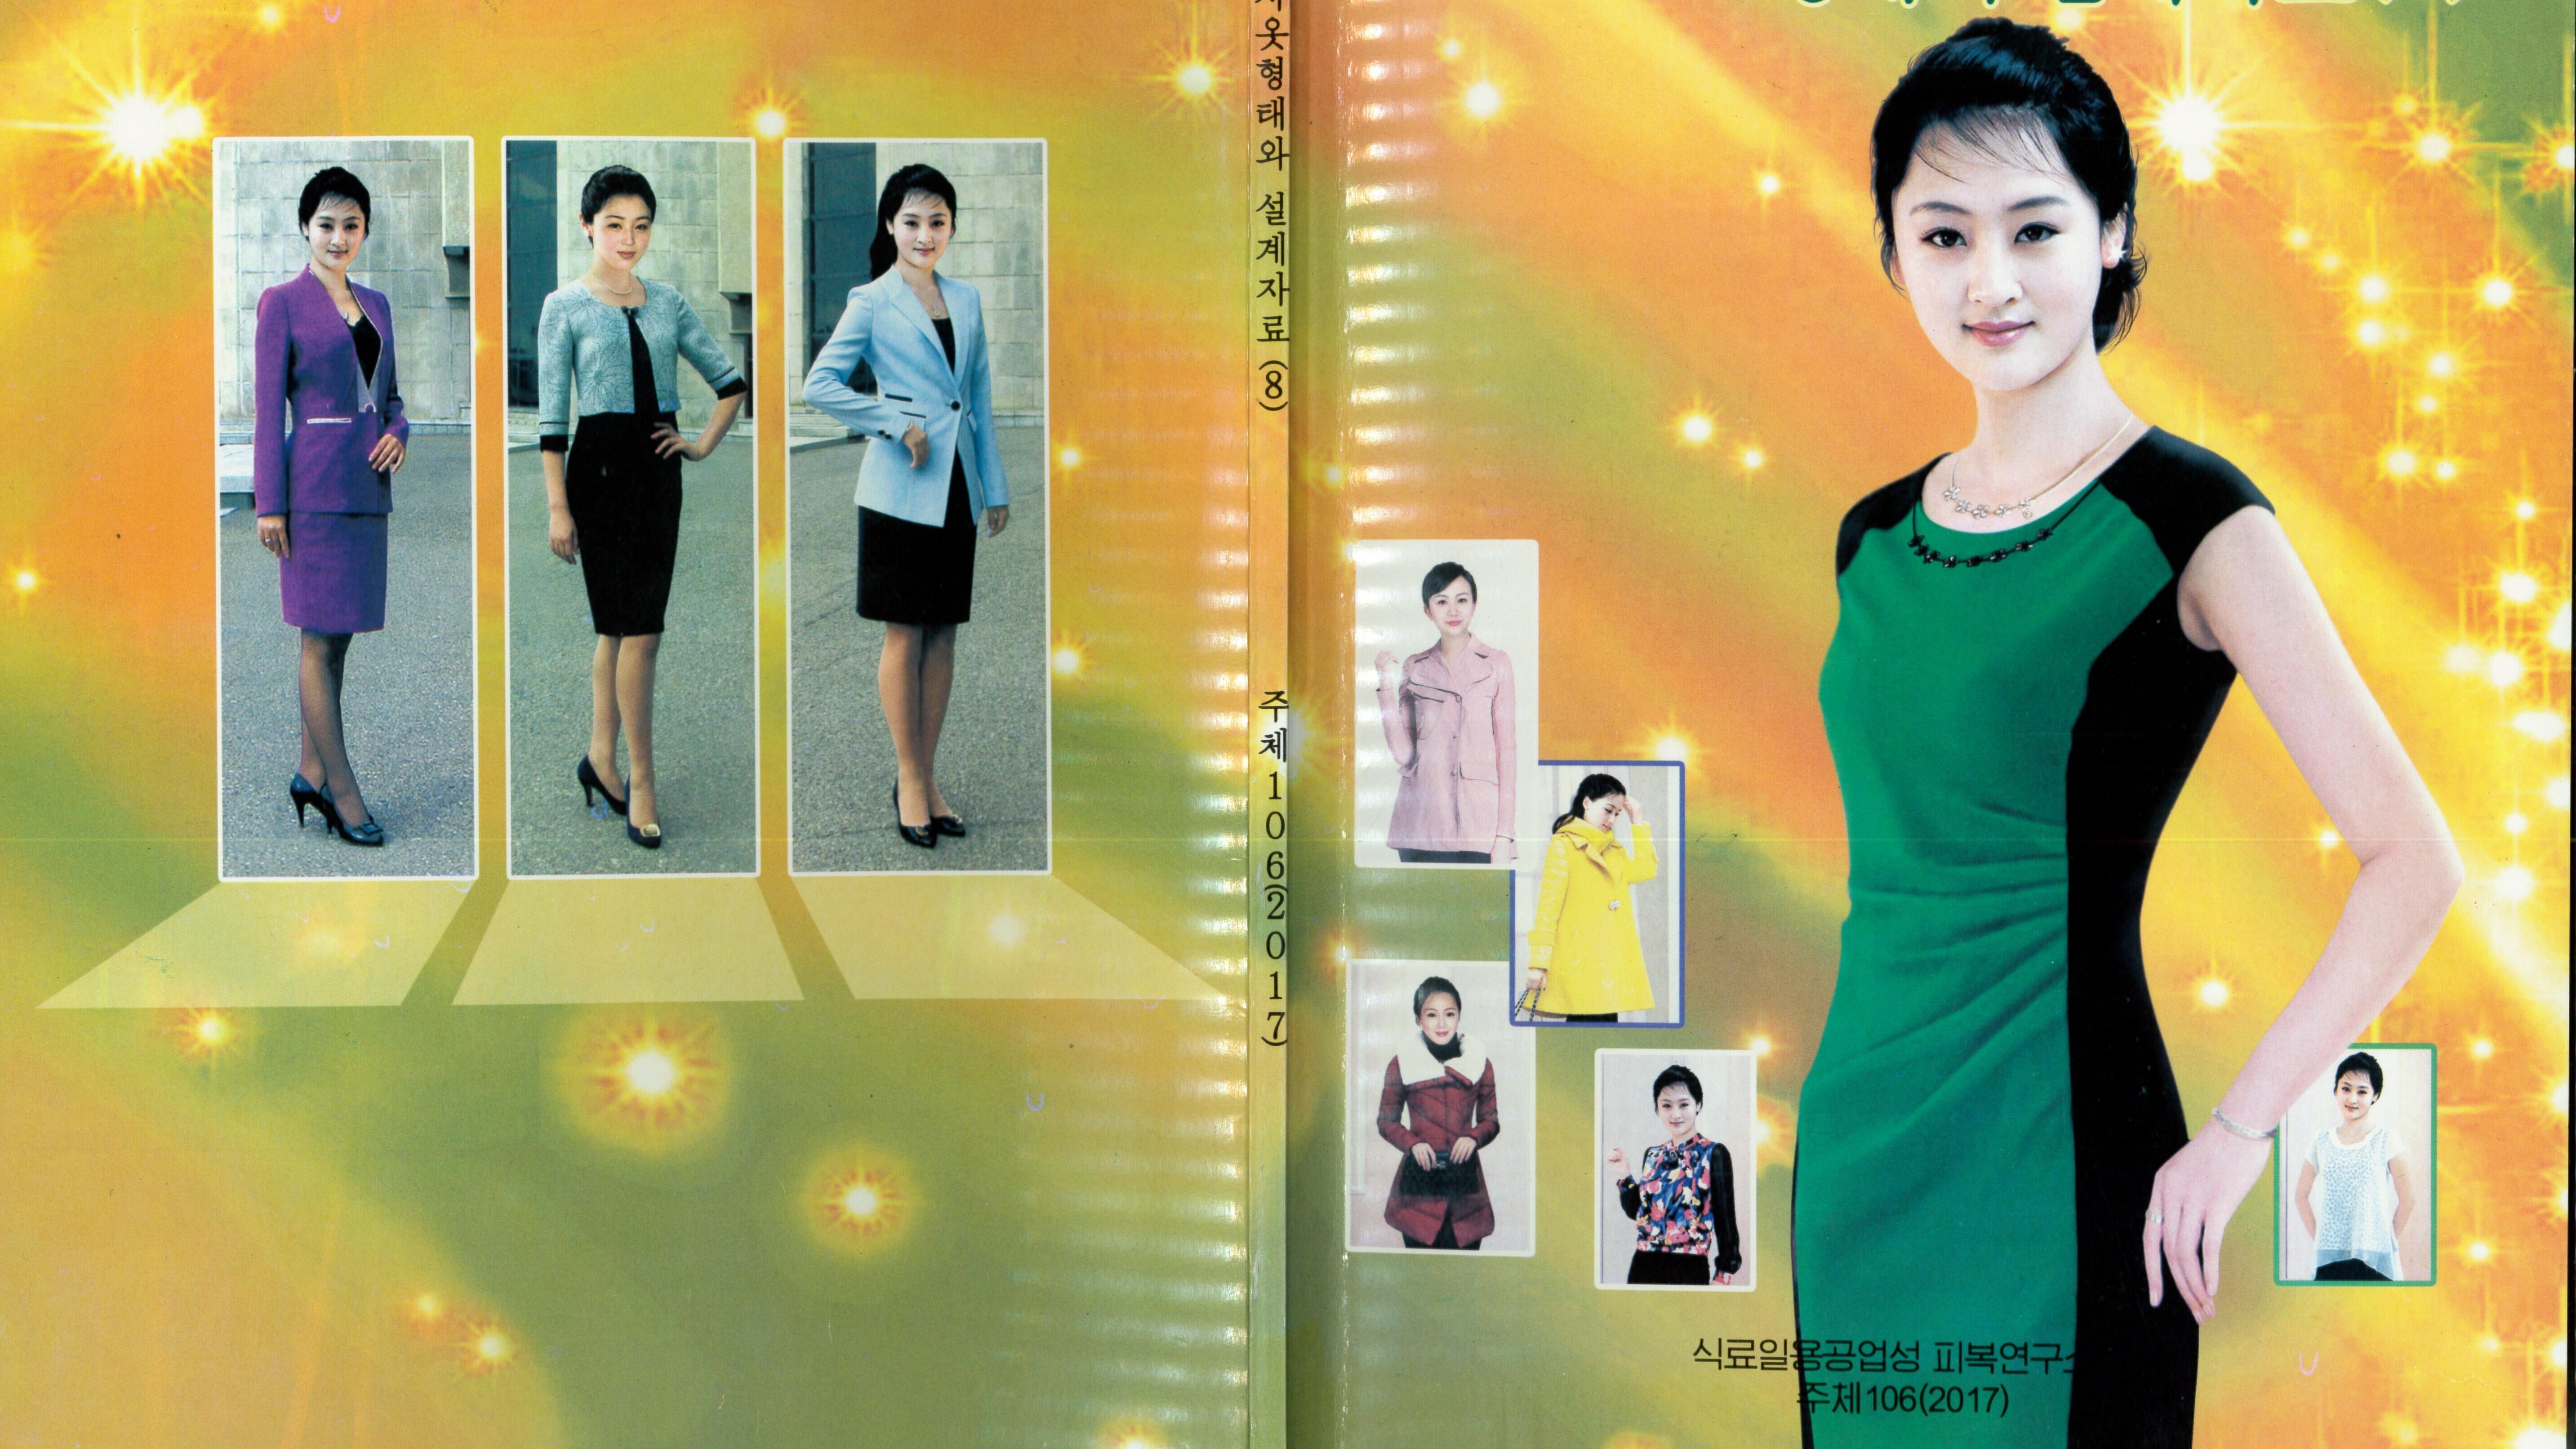 Make Women More Beautiful Inside A North Korean Fashion Magazine Nk News